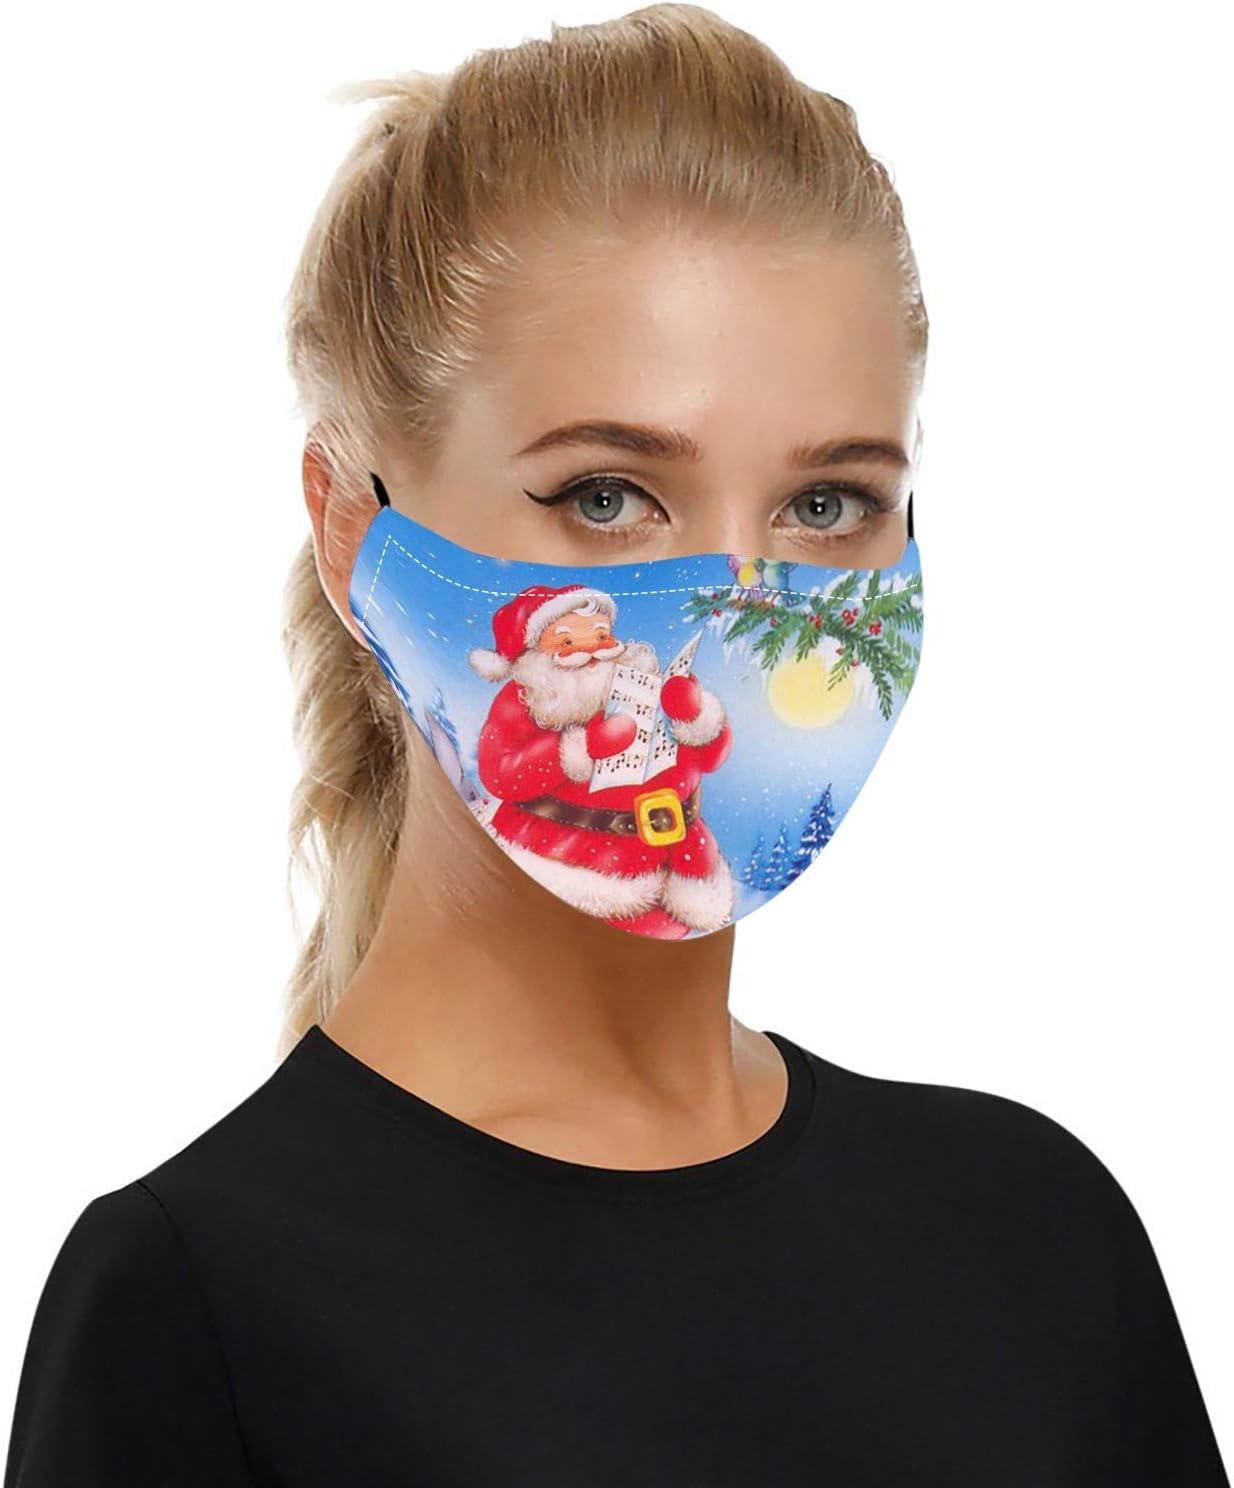 Men 35% OFF Women Denver Mall Face Accessories Covers Adjusta Protection Dustproof